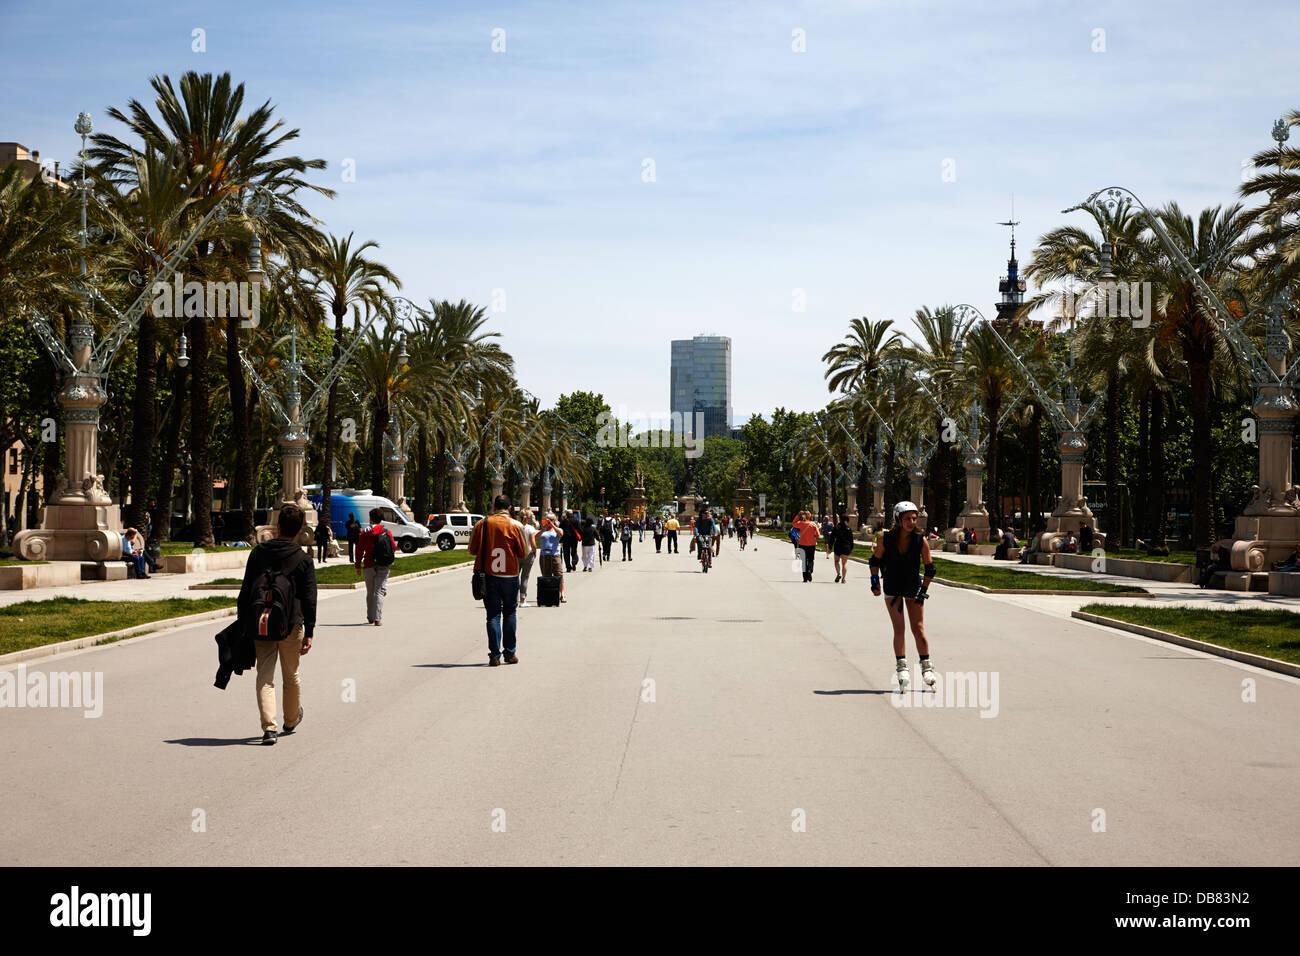 Passeig de Lluis companys promenade Barcelona Catalonia Spain - Stock Image